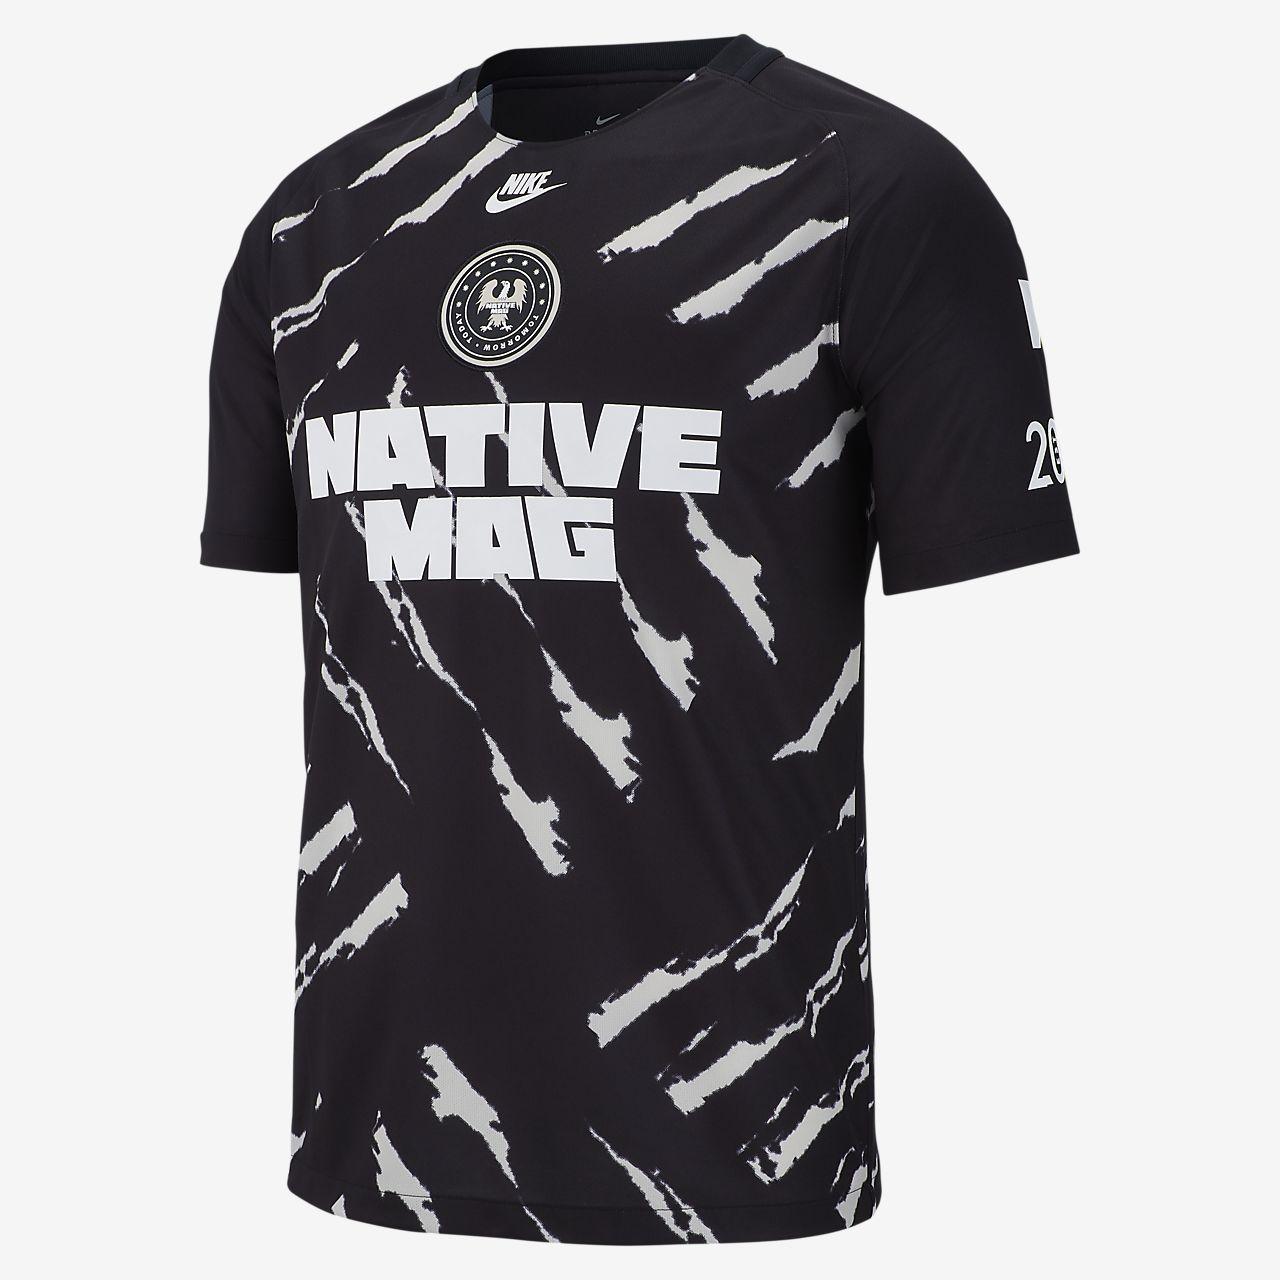 25c55356cfaf Nike Football x THE NATIVE Men s Football Shirt. Nike.com GB